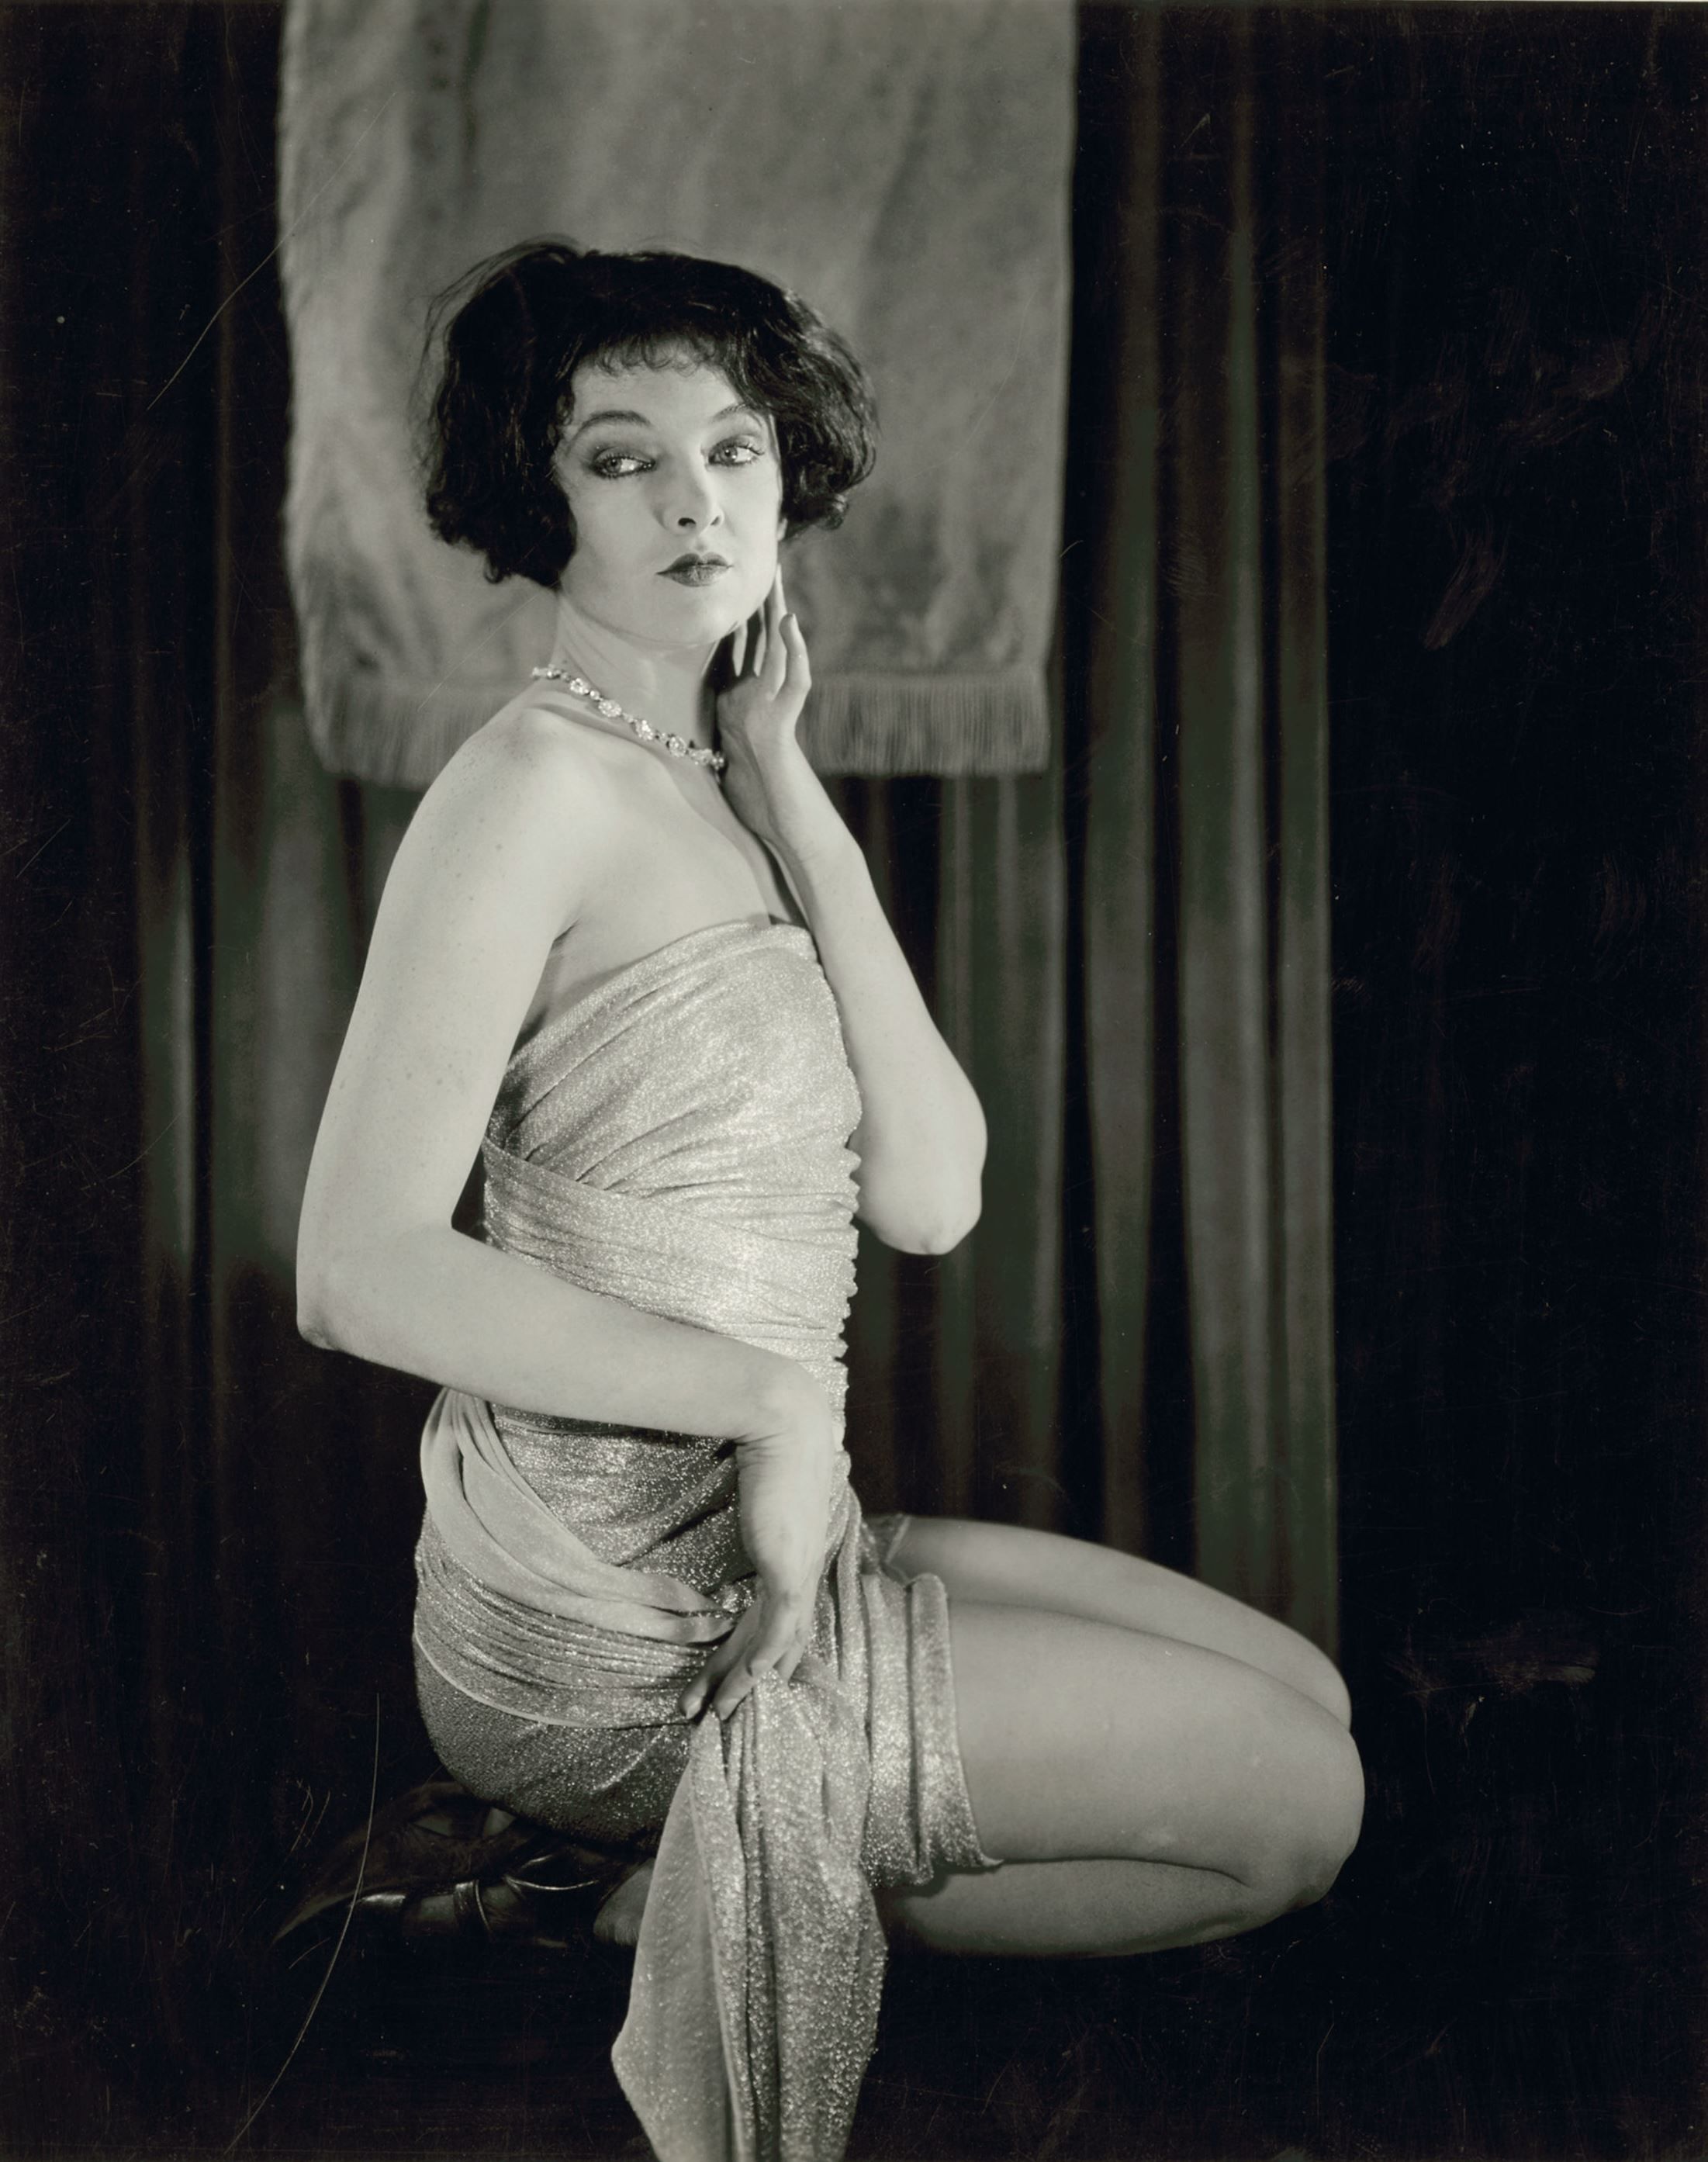 Preston Duncan. Portrait of Myrna Loy  1920's. Via theredlist